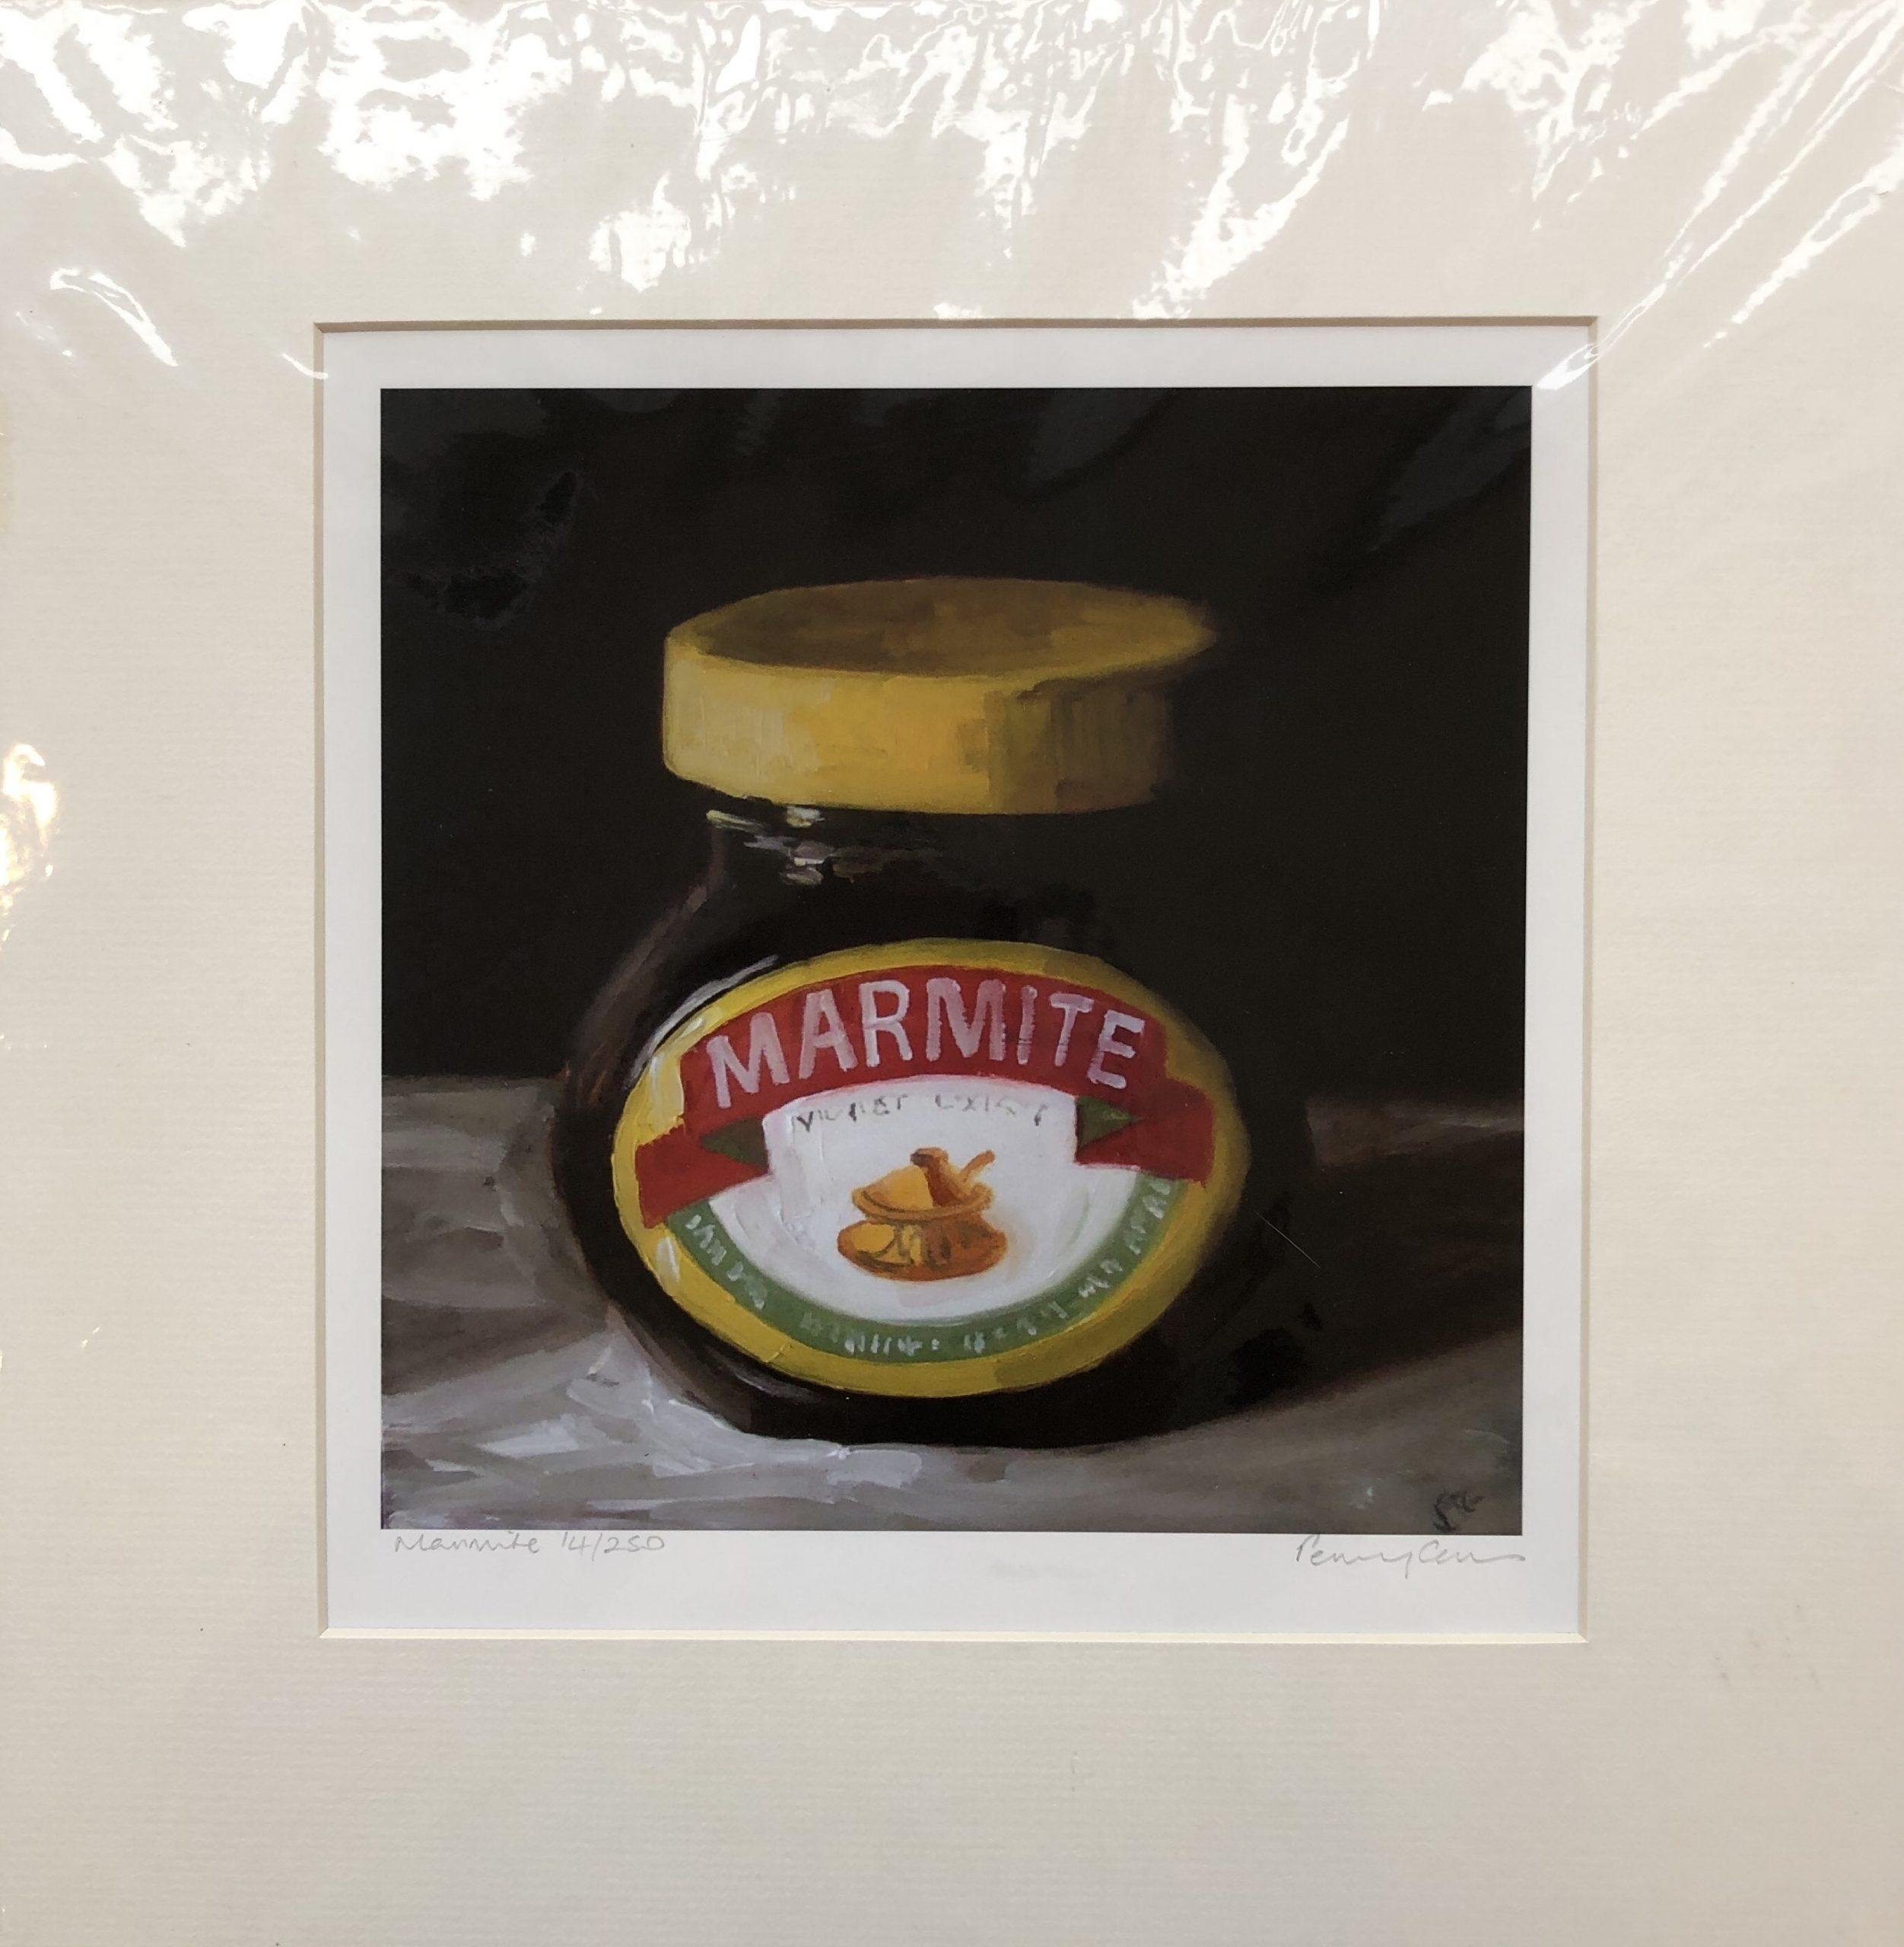 Marmite by Penny German